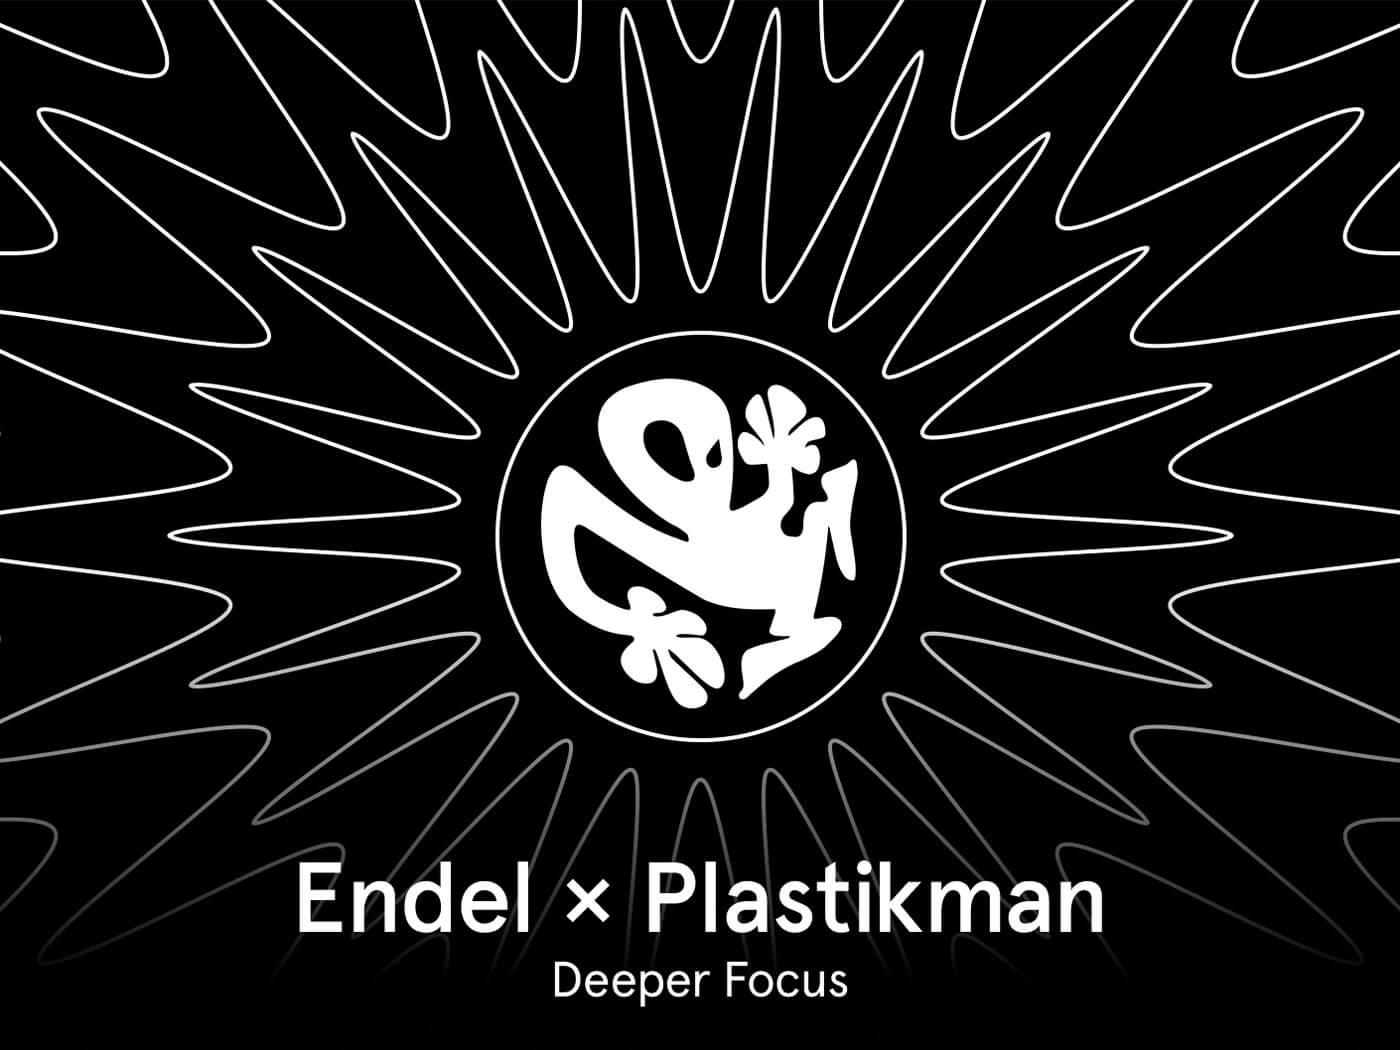 Endel x Plastikman